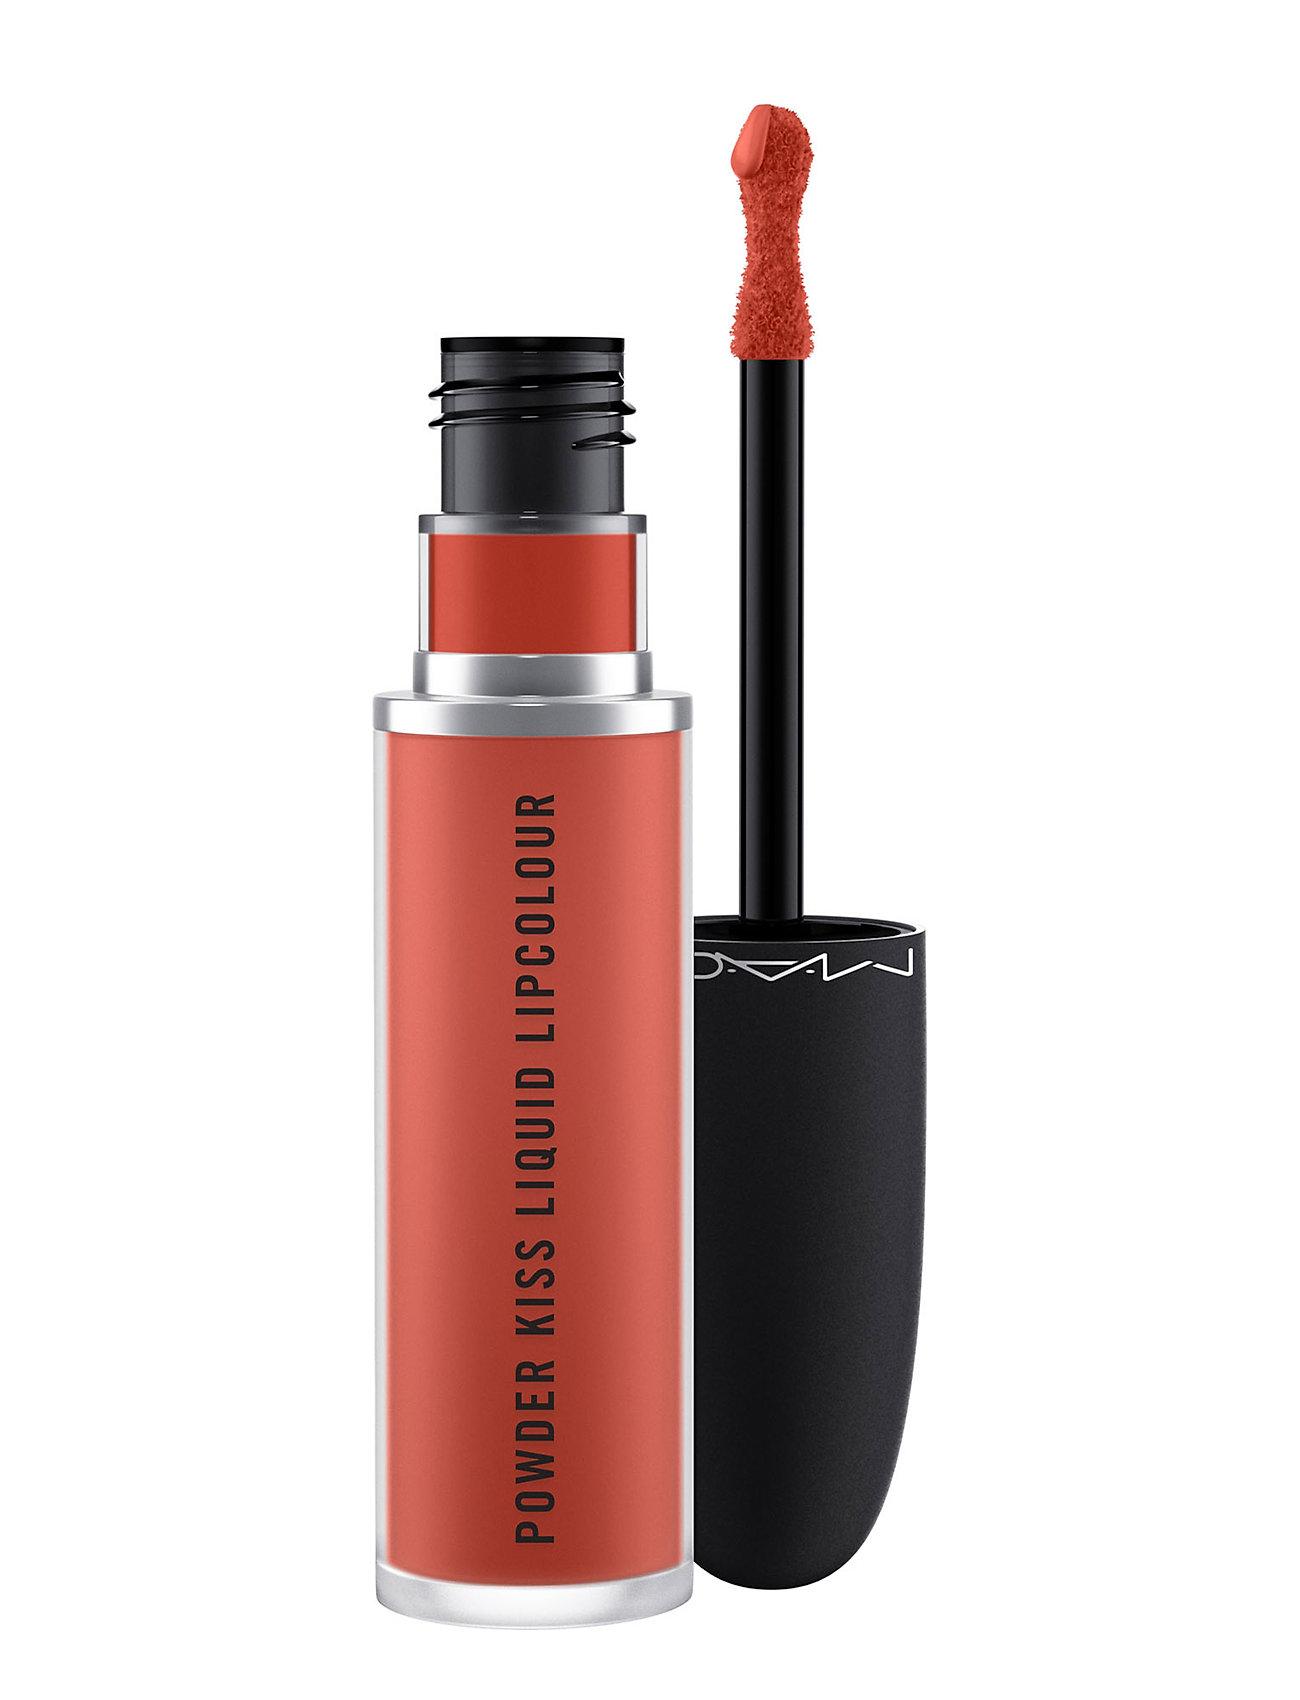 Image of Powder Kiss Liquid Lipcolour Lipgloss Makeup Rød M.A.C. (3406304199)